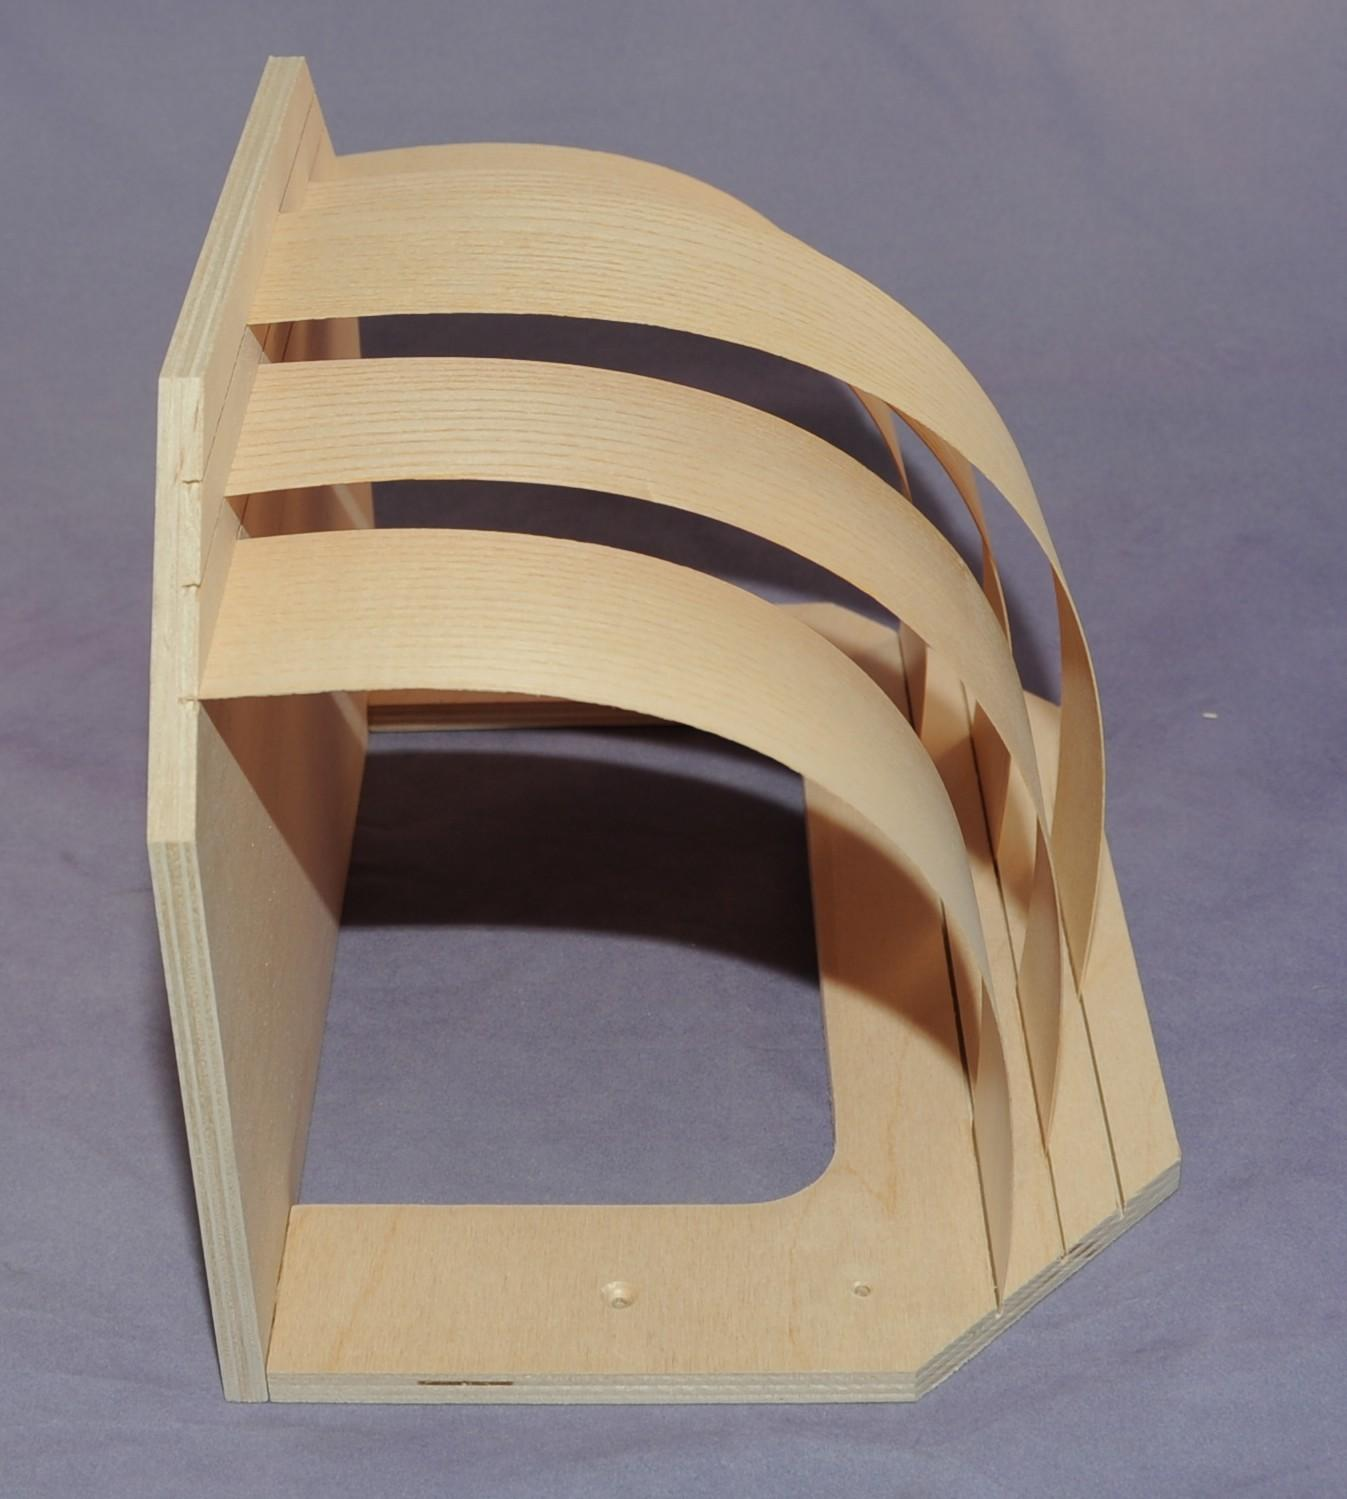 Holzblendschirm Ecke aus Sperrholz